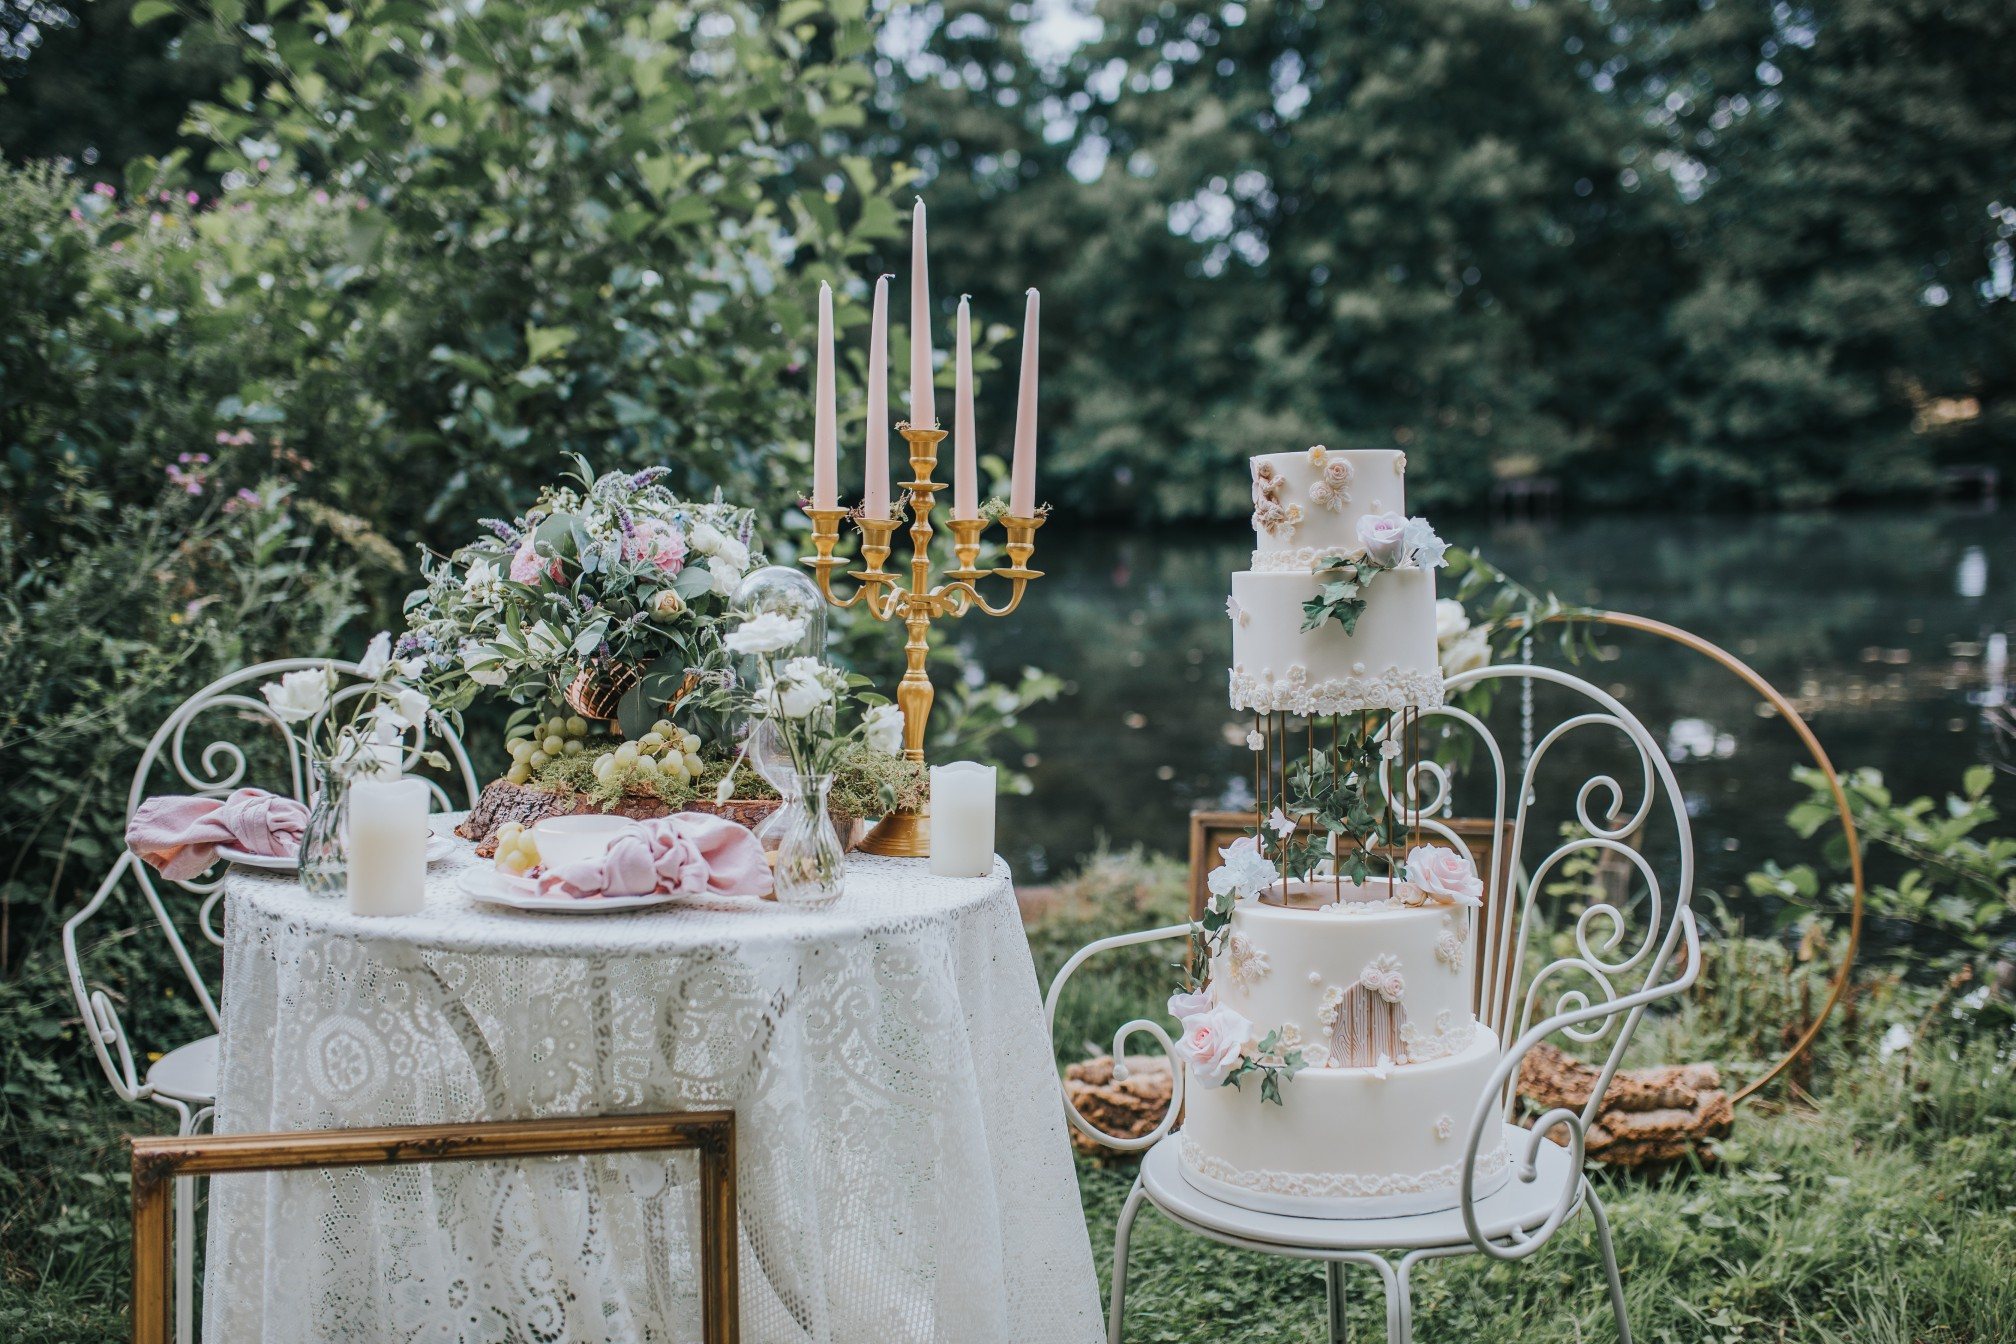 fairy wedding - whimsical wedding - magical wedding - vintage wedding decor - floating tier wedding cake - whimsical wedding decor